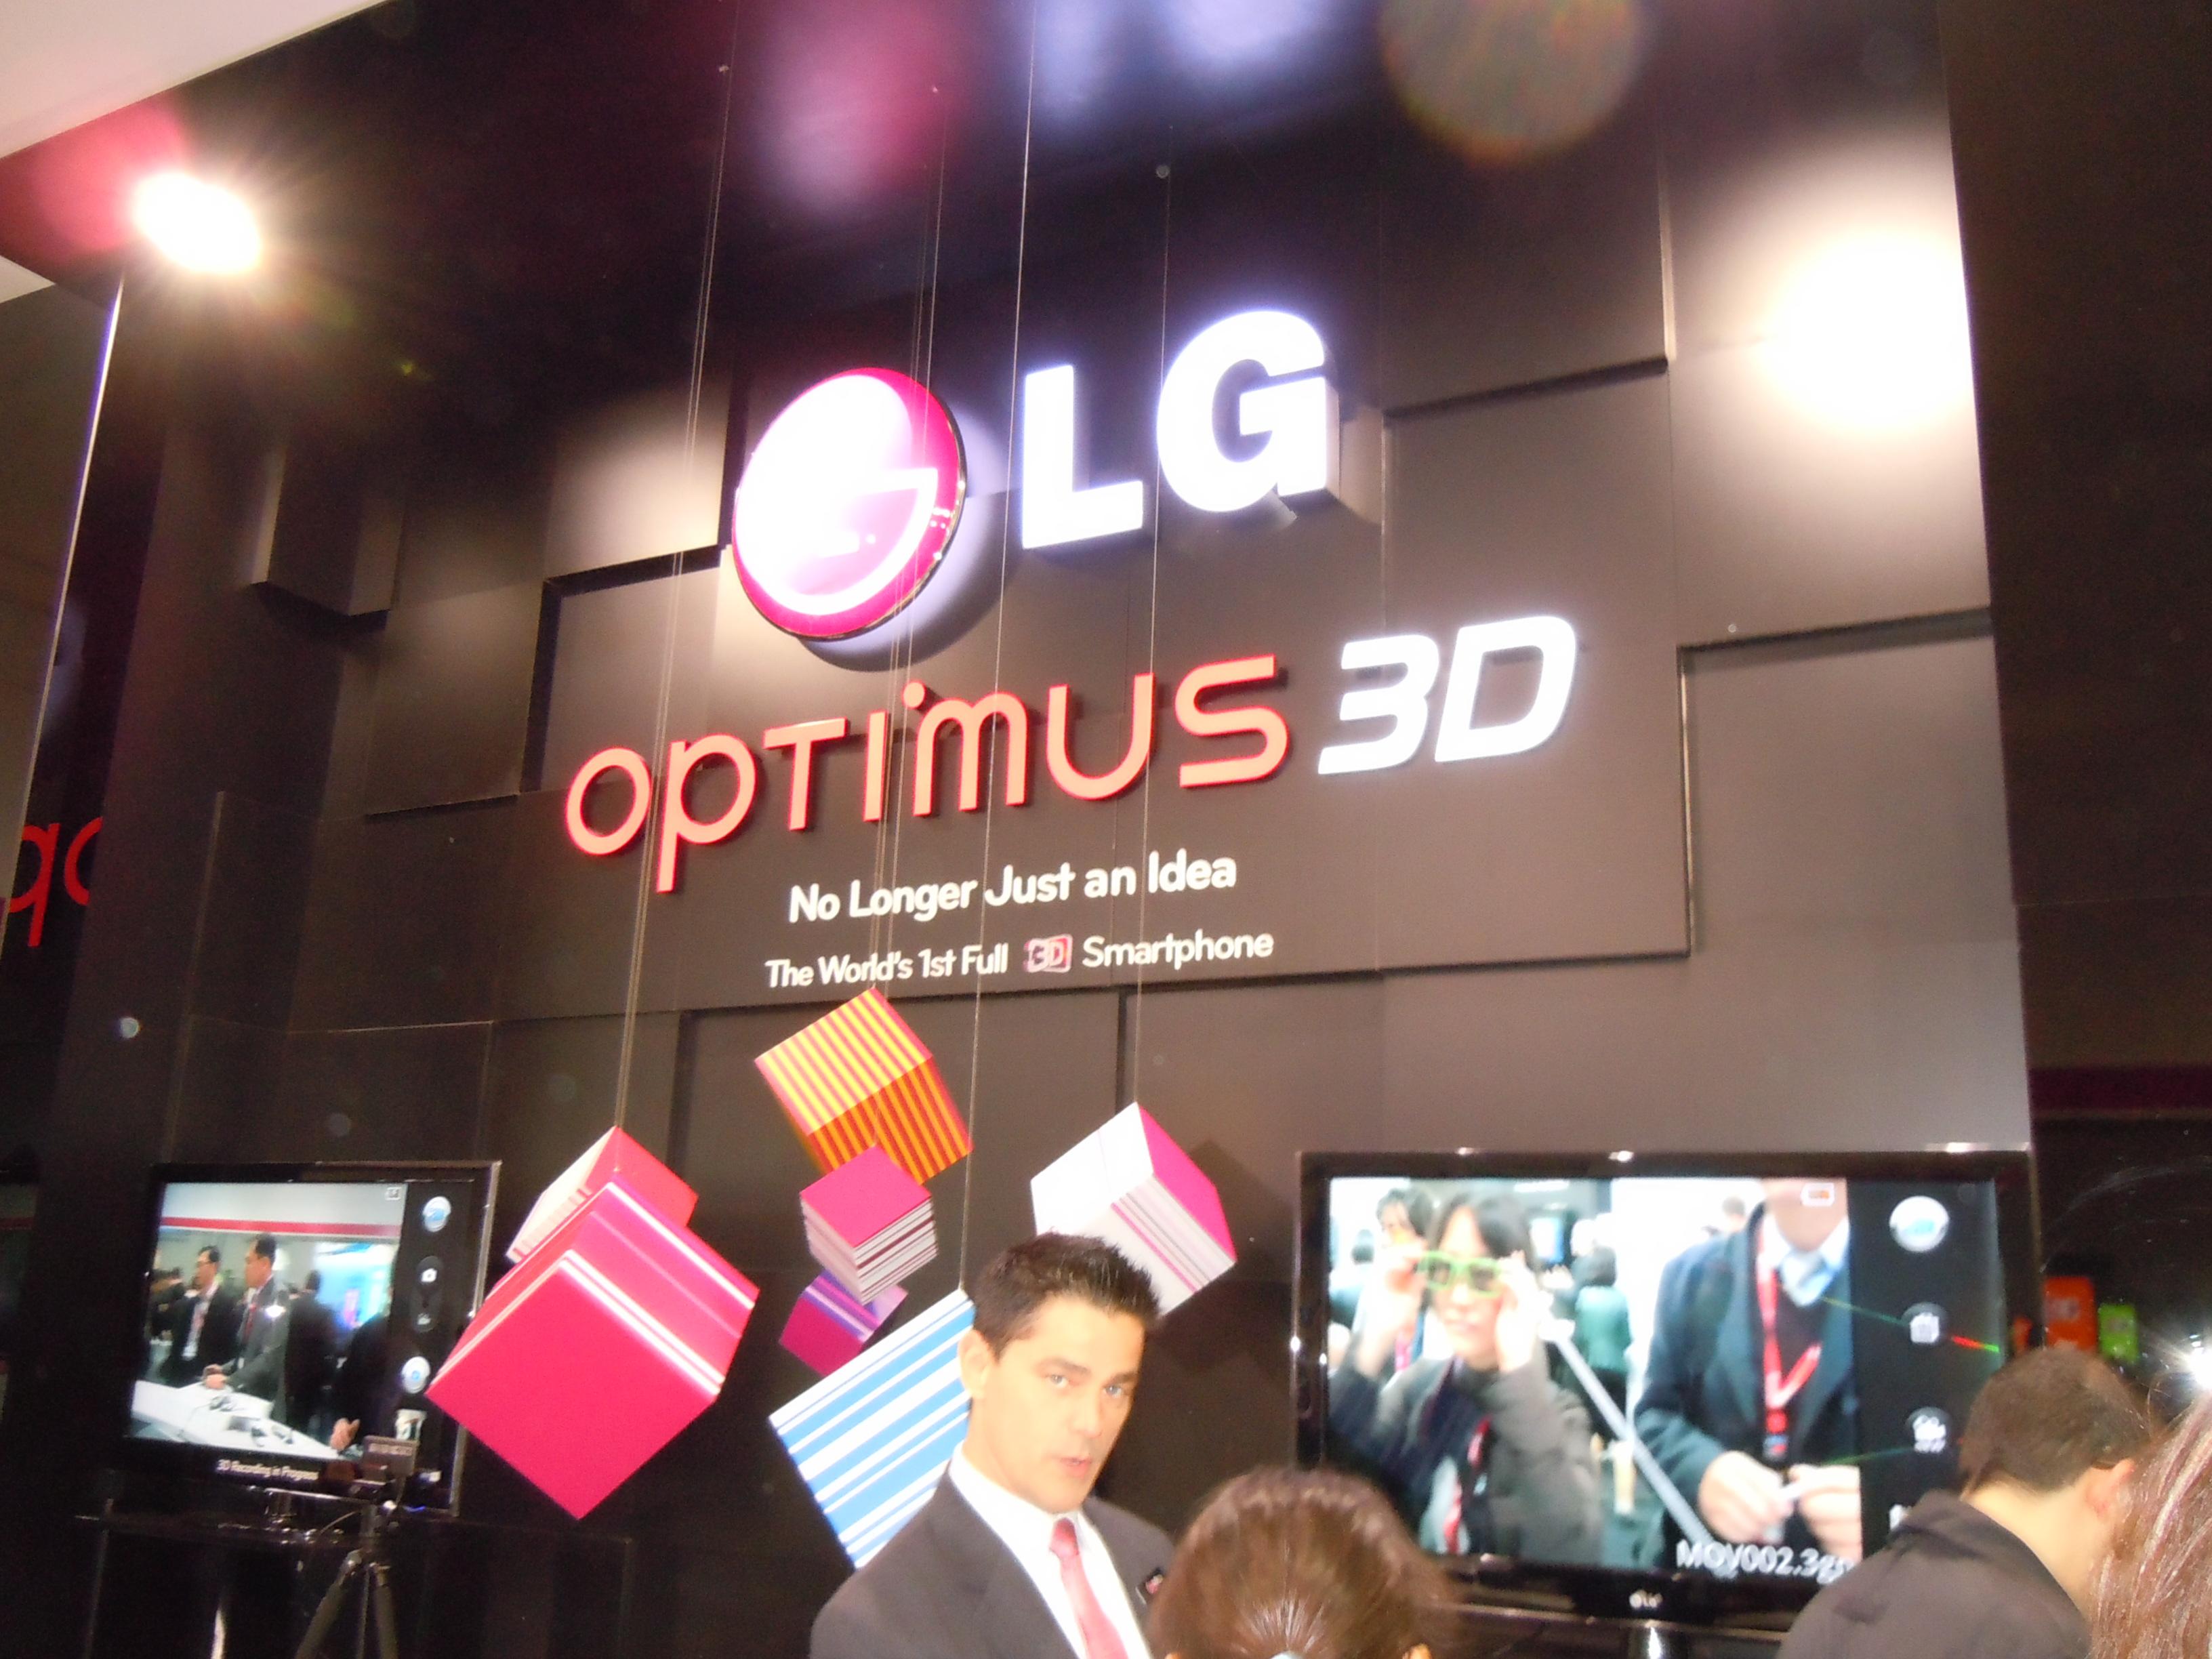 LG Revolution, 3D & 2X Hands On